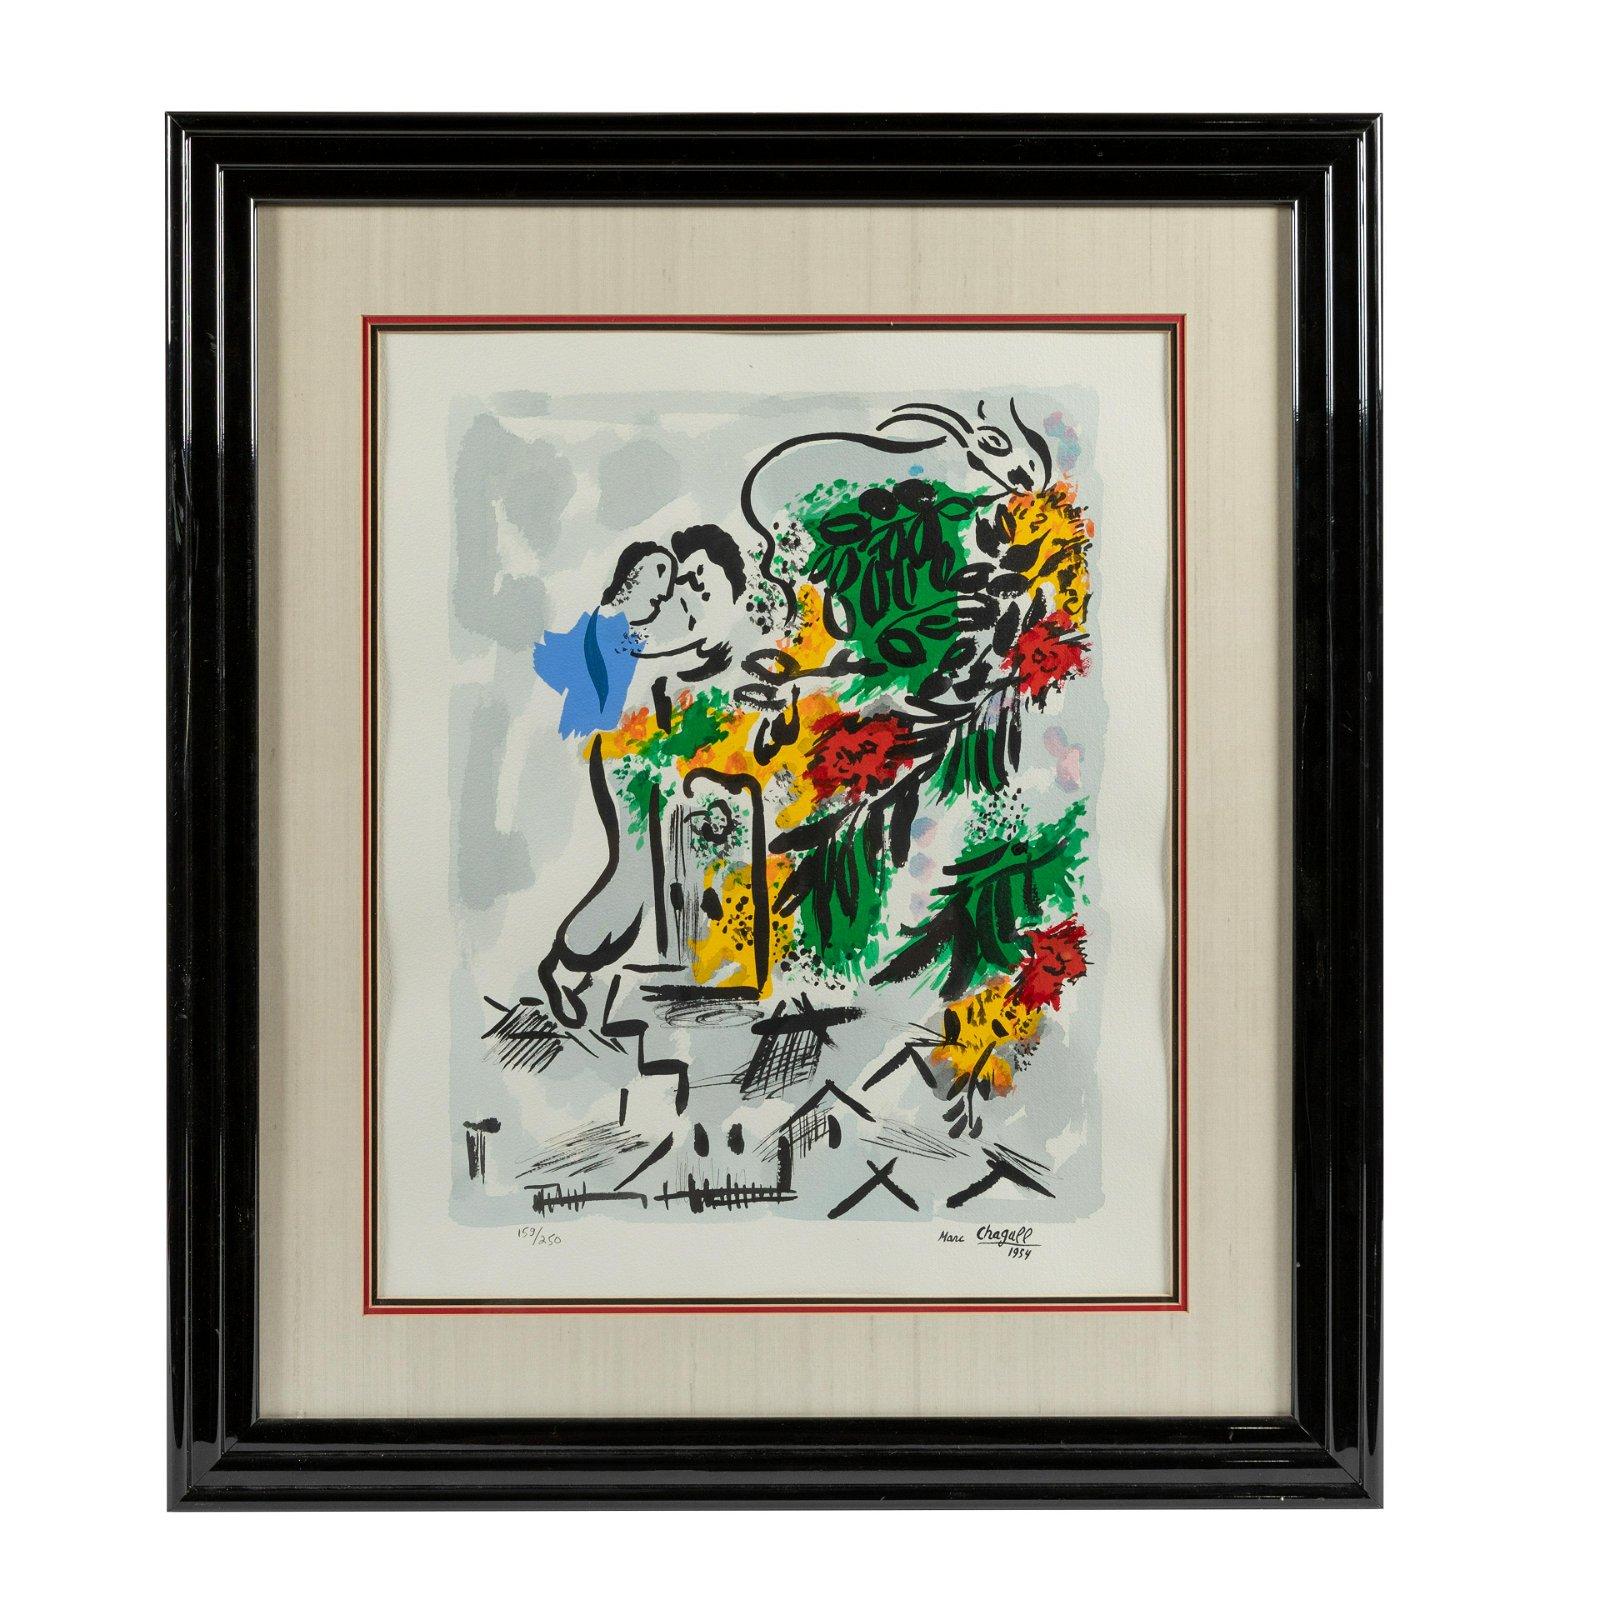 Marc Chagall - Lithograph